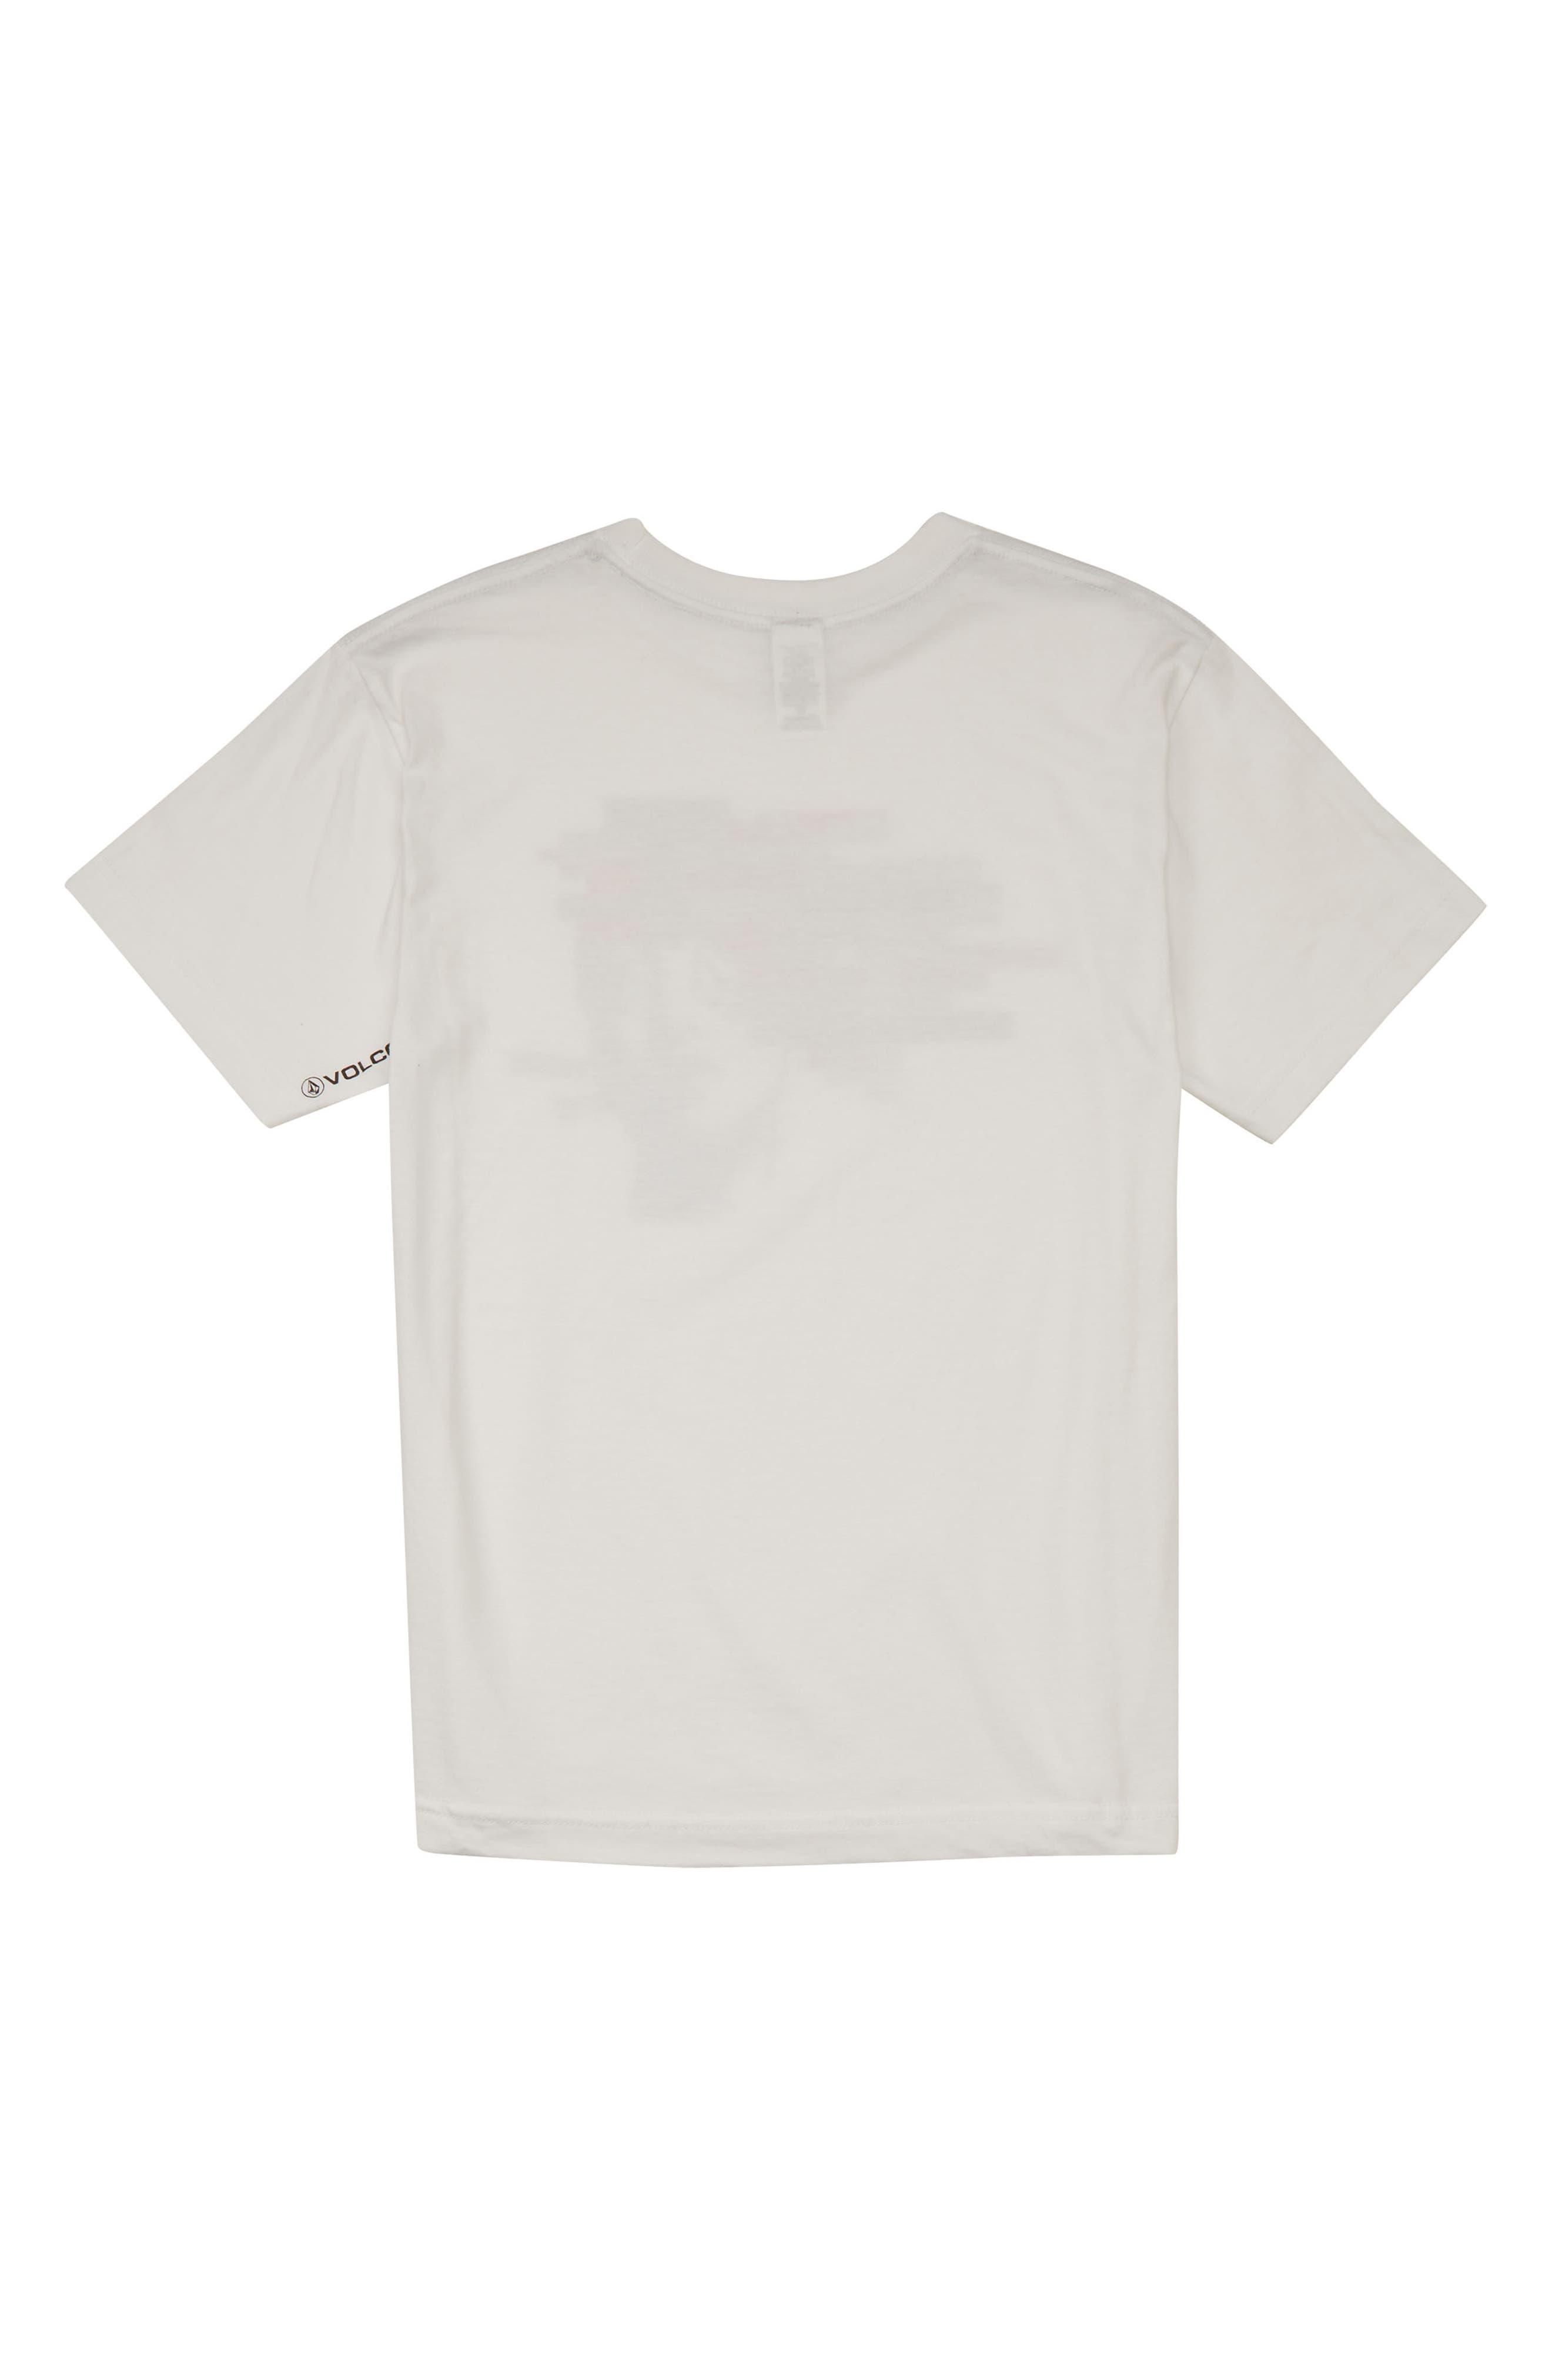 Noa Noisehead Graphic T-Shirt,                             Alternate thumbnail 2, color,                             WHITE